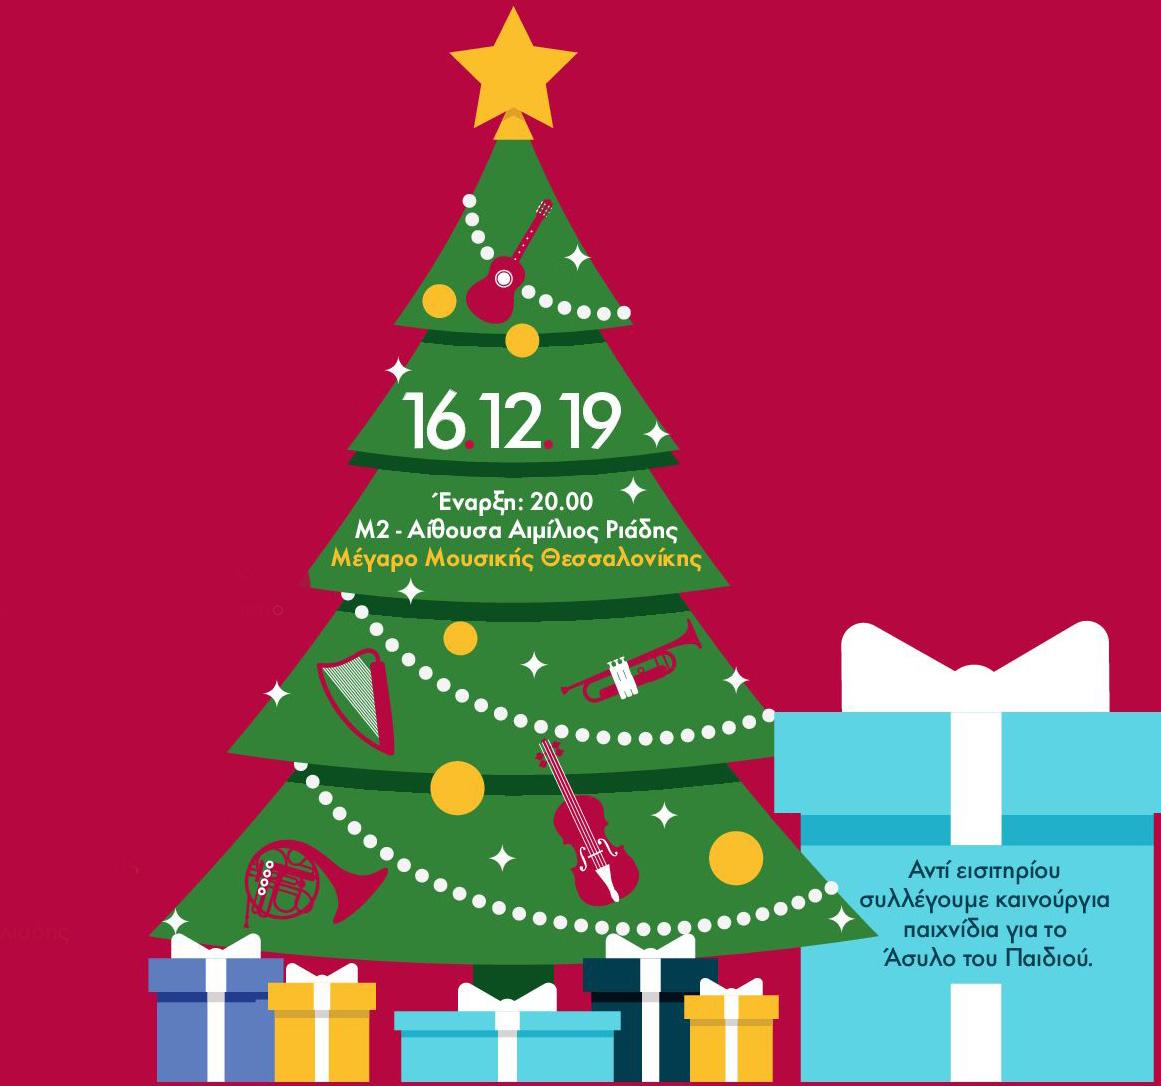 """Little stars in concert"": Χριστουγεννιάτικη φιλανθρωπική συναυλία ΣΟΔΘ"